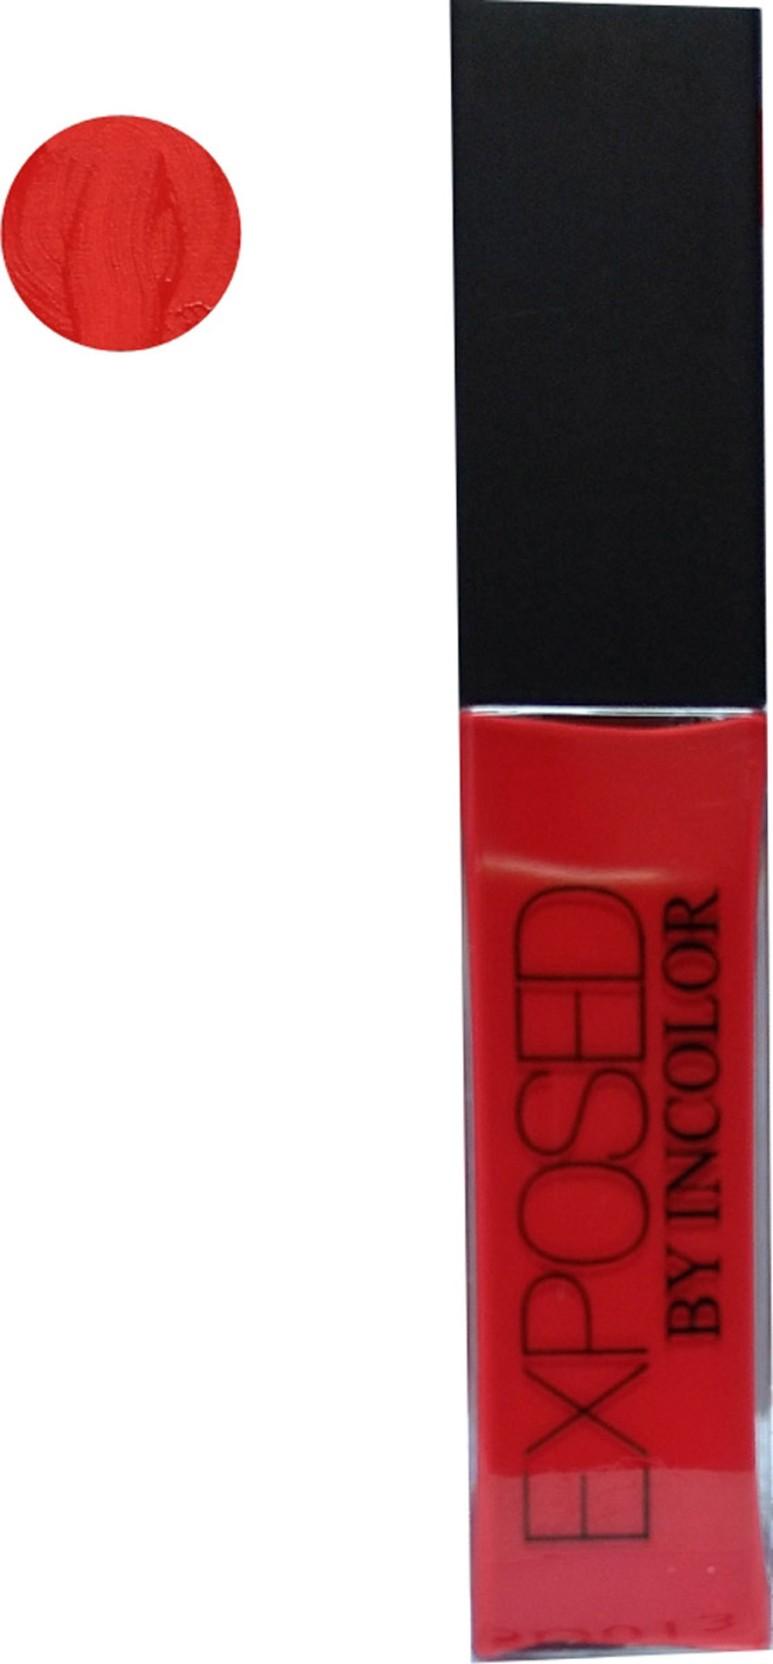 Incolor Exposed Soft Matte Lip Cream Lipstick Price In India Buy Lipcream Lipstik On Offer